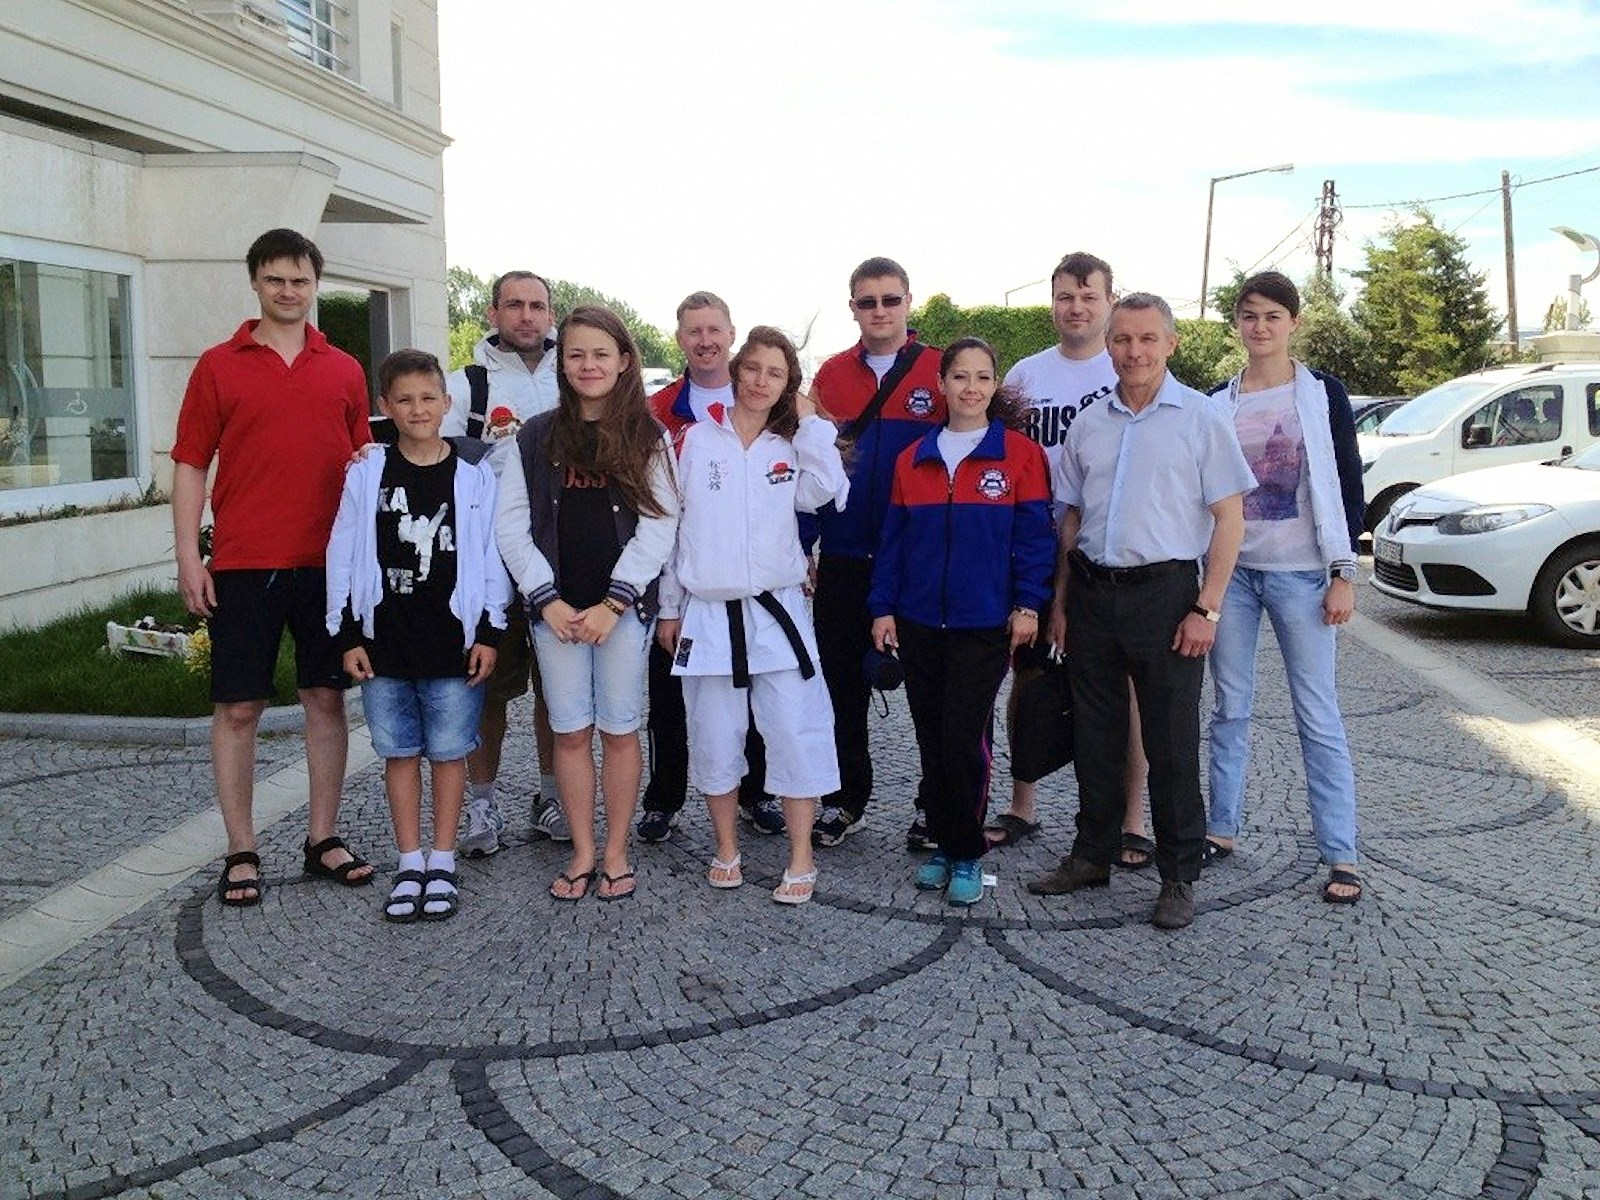 00 DNR karate 02. 05.06.15